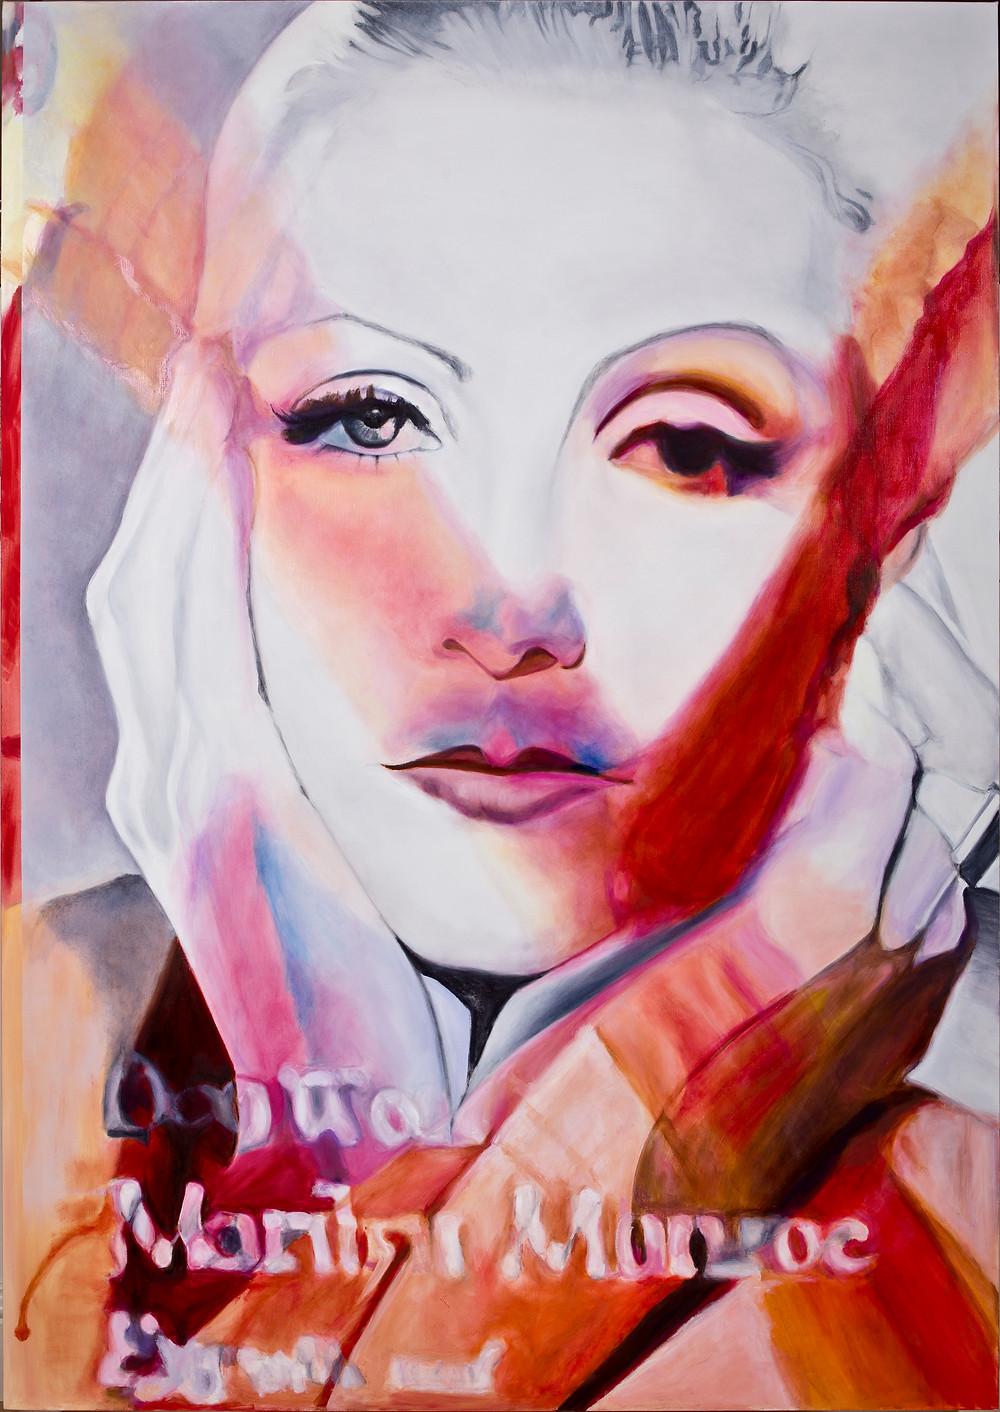 Goddess 2 1600mm x 1300mm Oil on Linen Canvas. Laura Harold